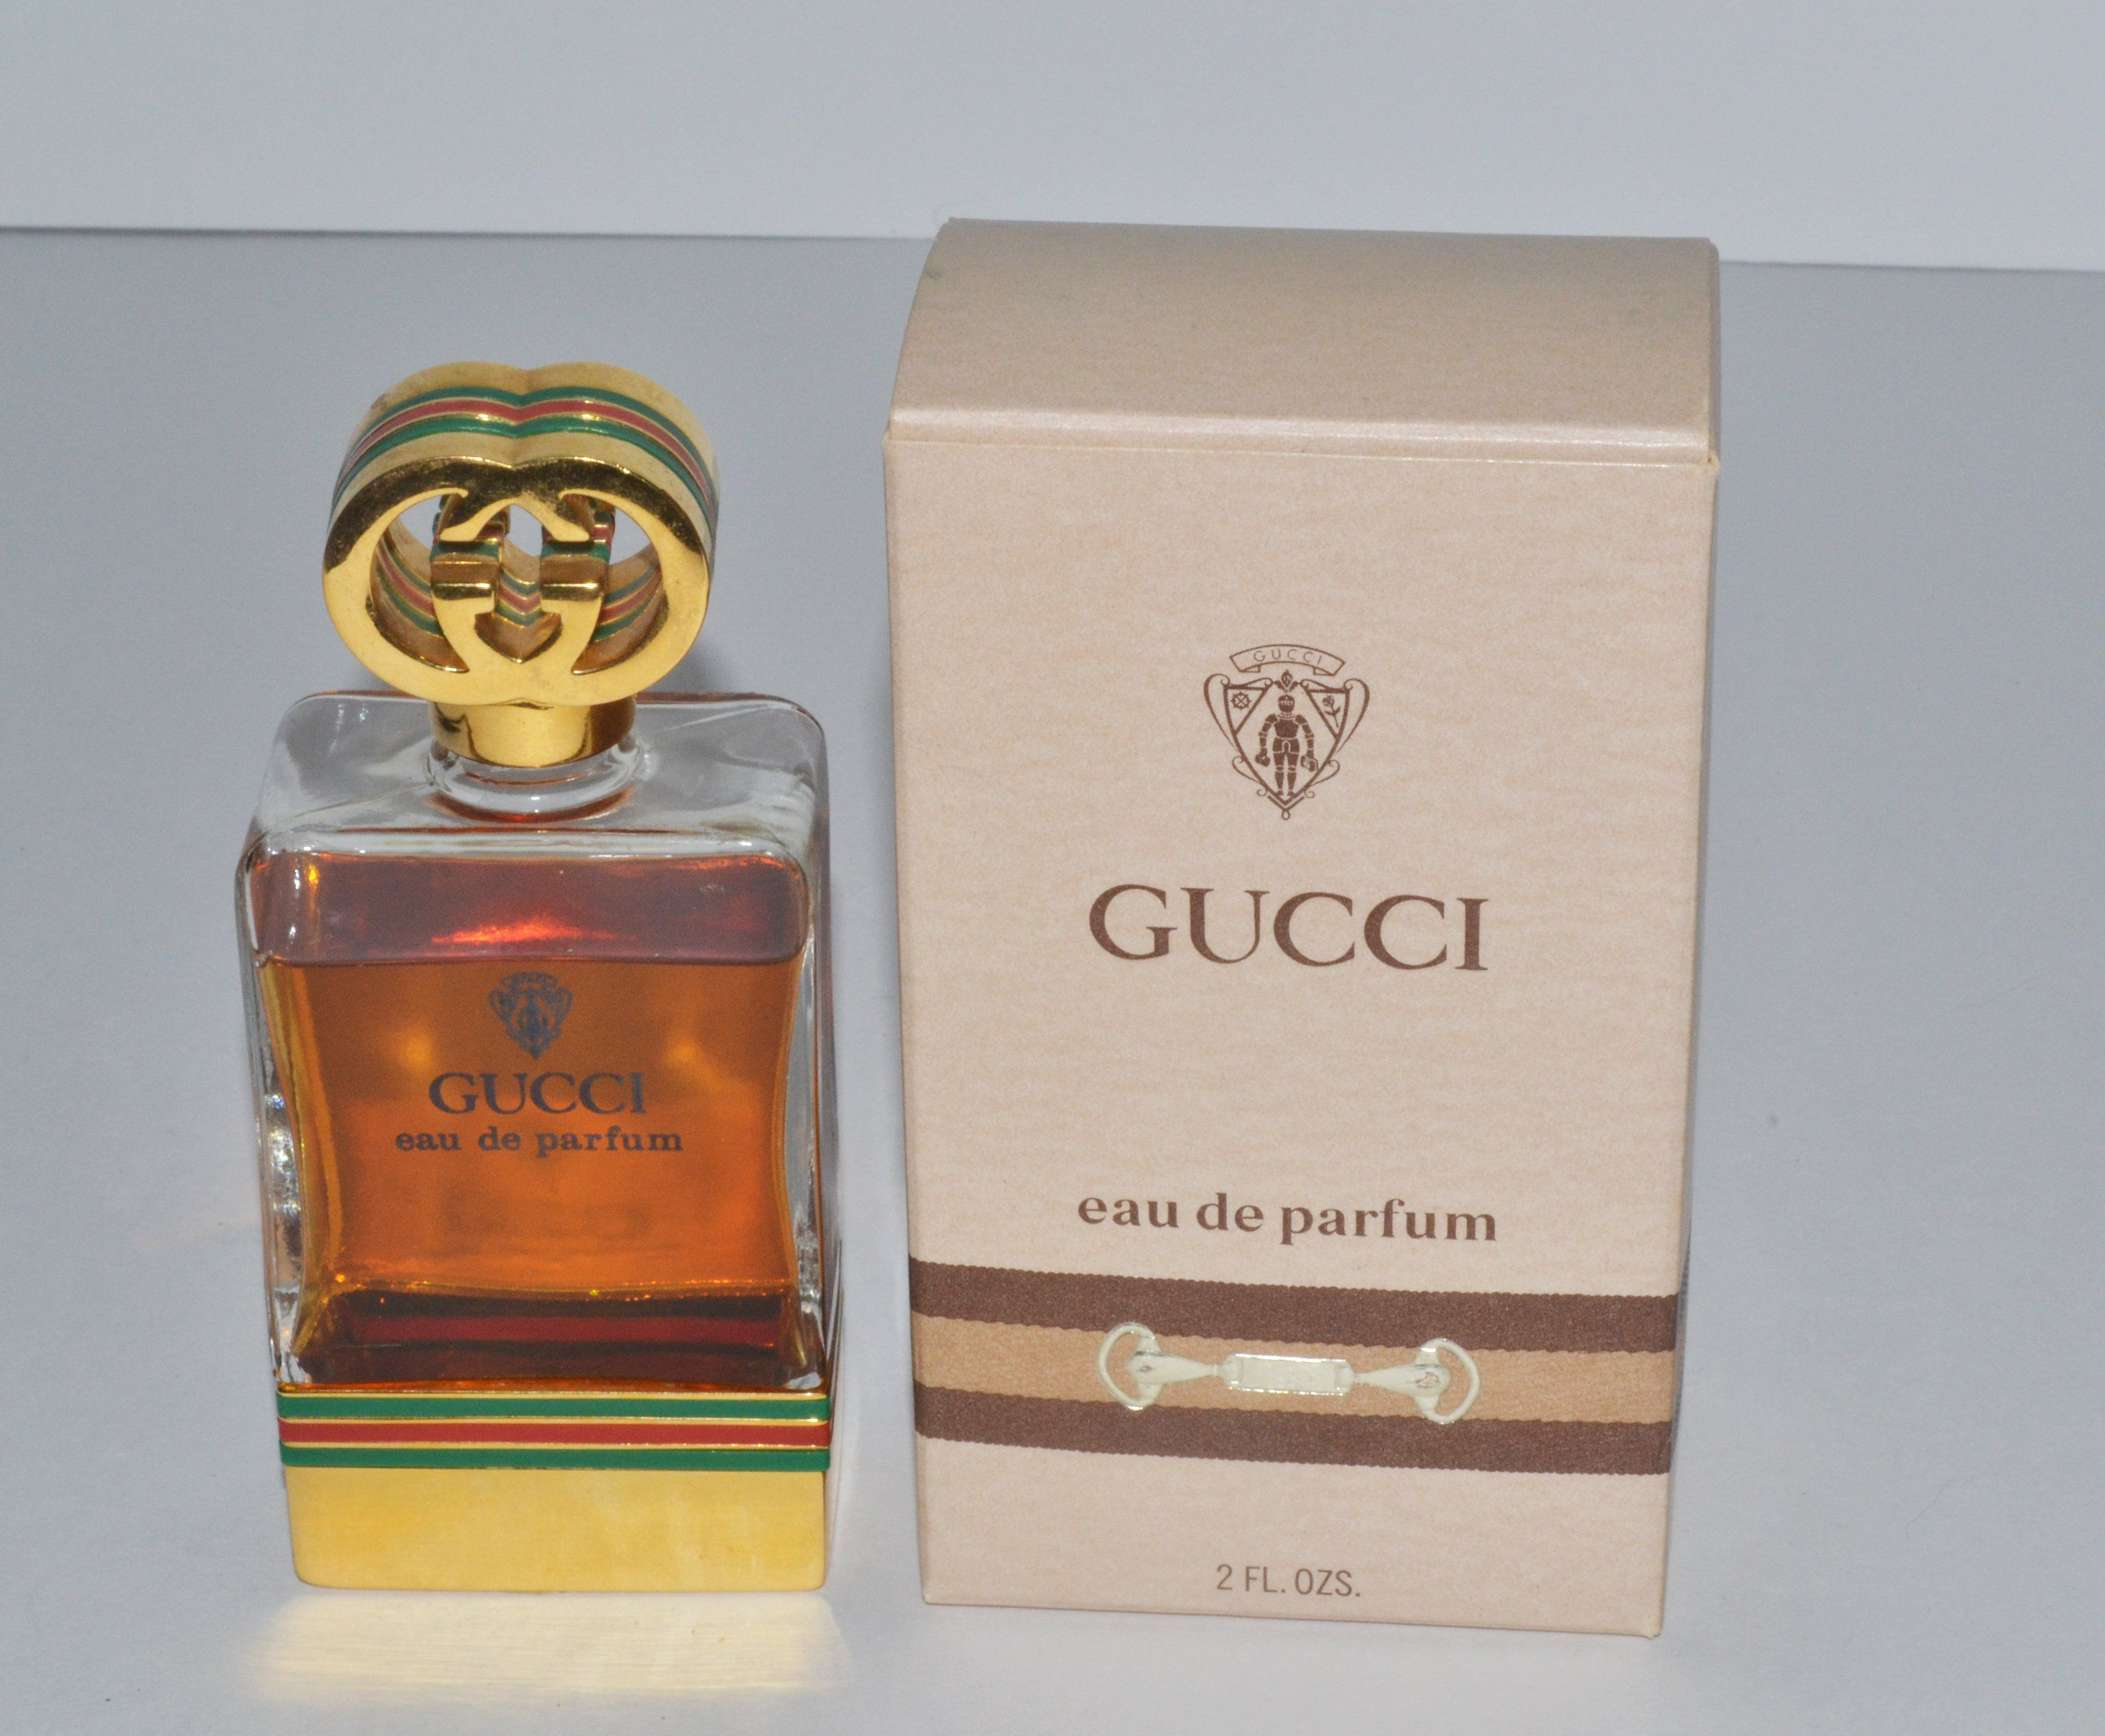 b8a70b17d4554 Gucci Eau De Parfum in 2019 | Vintage Perfumes & Fragrances | Gucci ...